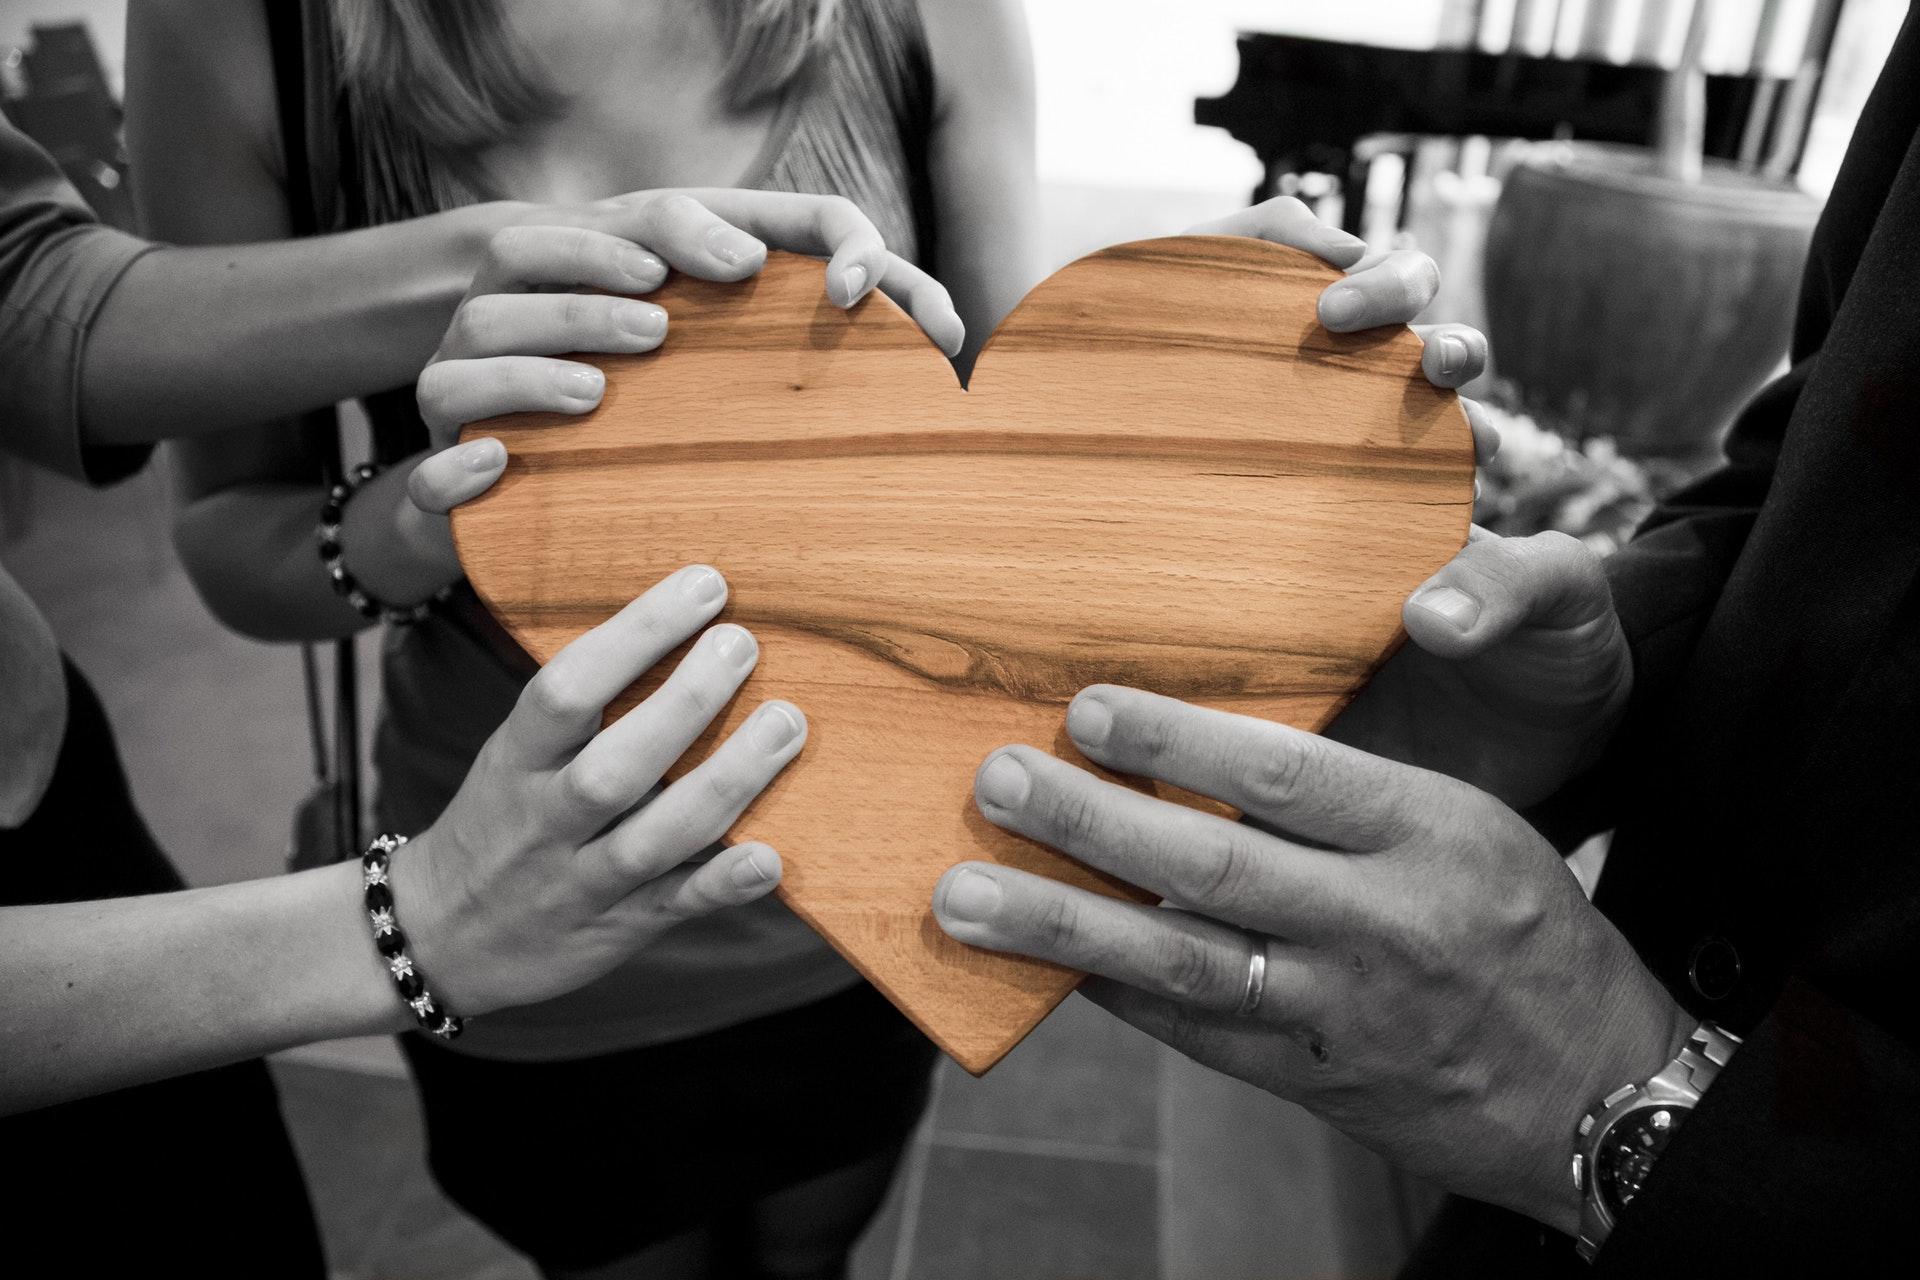 Compassionate communitcate deb palmer george